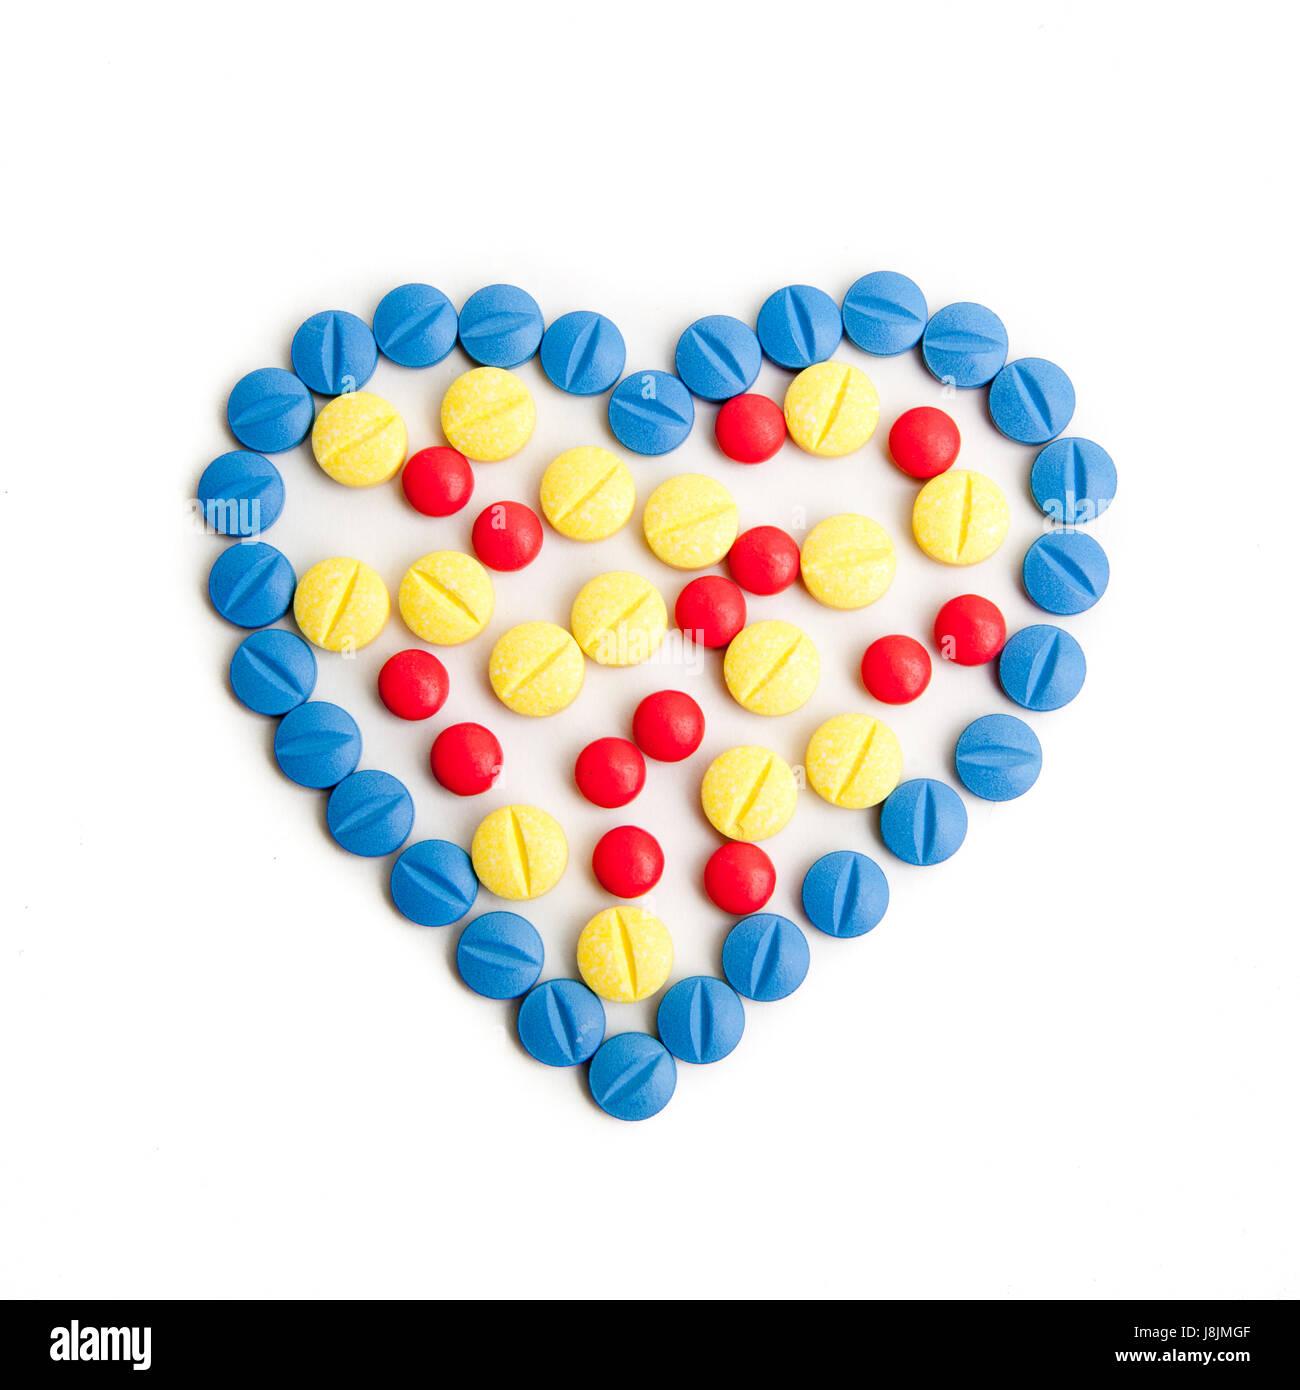 material, drug, anaesthetic, addictive drug, medicament, means, agent, - Stock Image